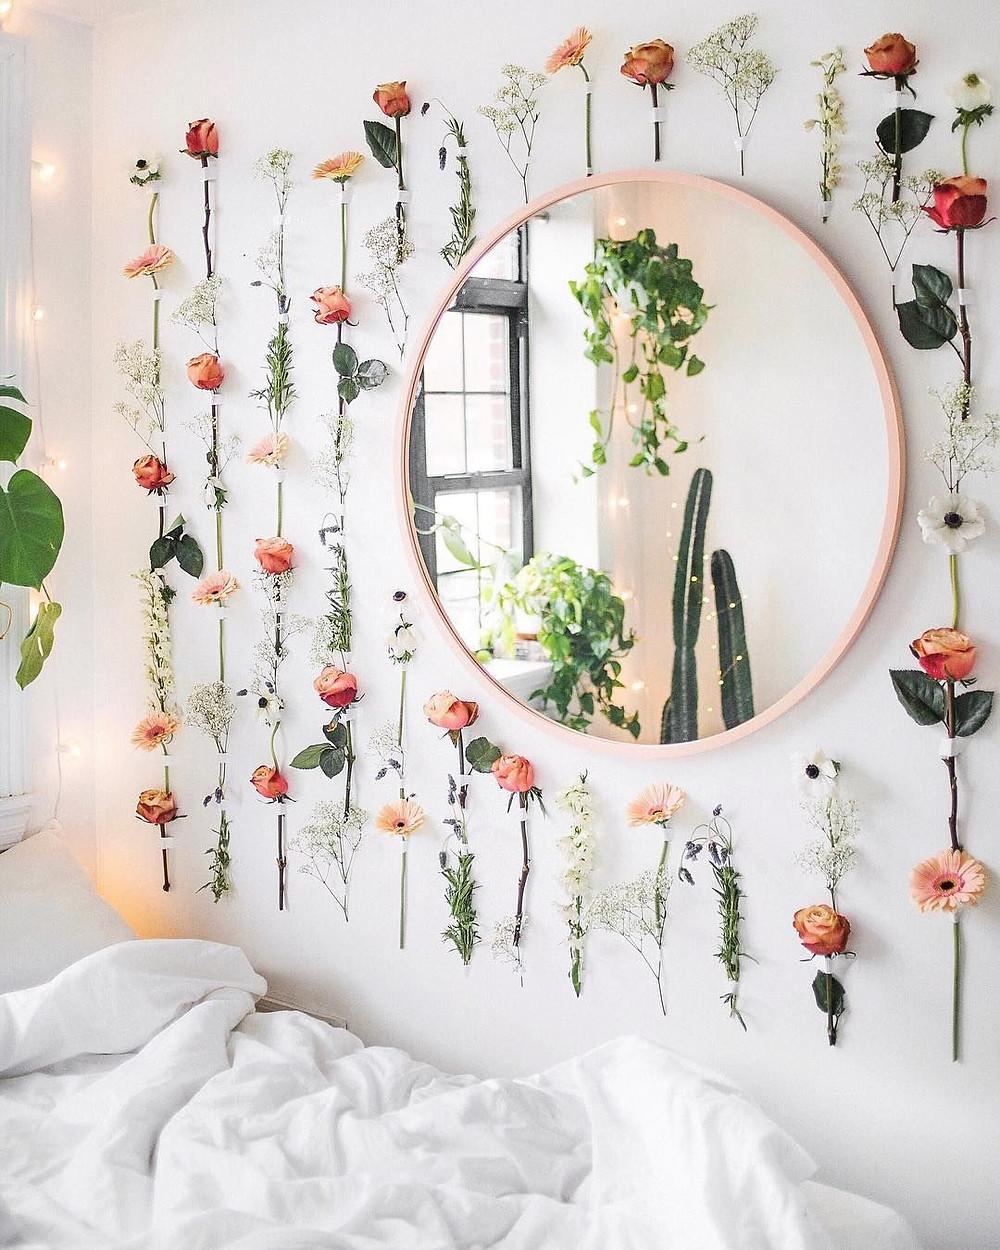 PRETTY GIRLY BEDROOM IDEAS